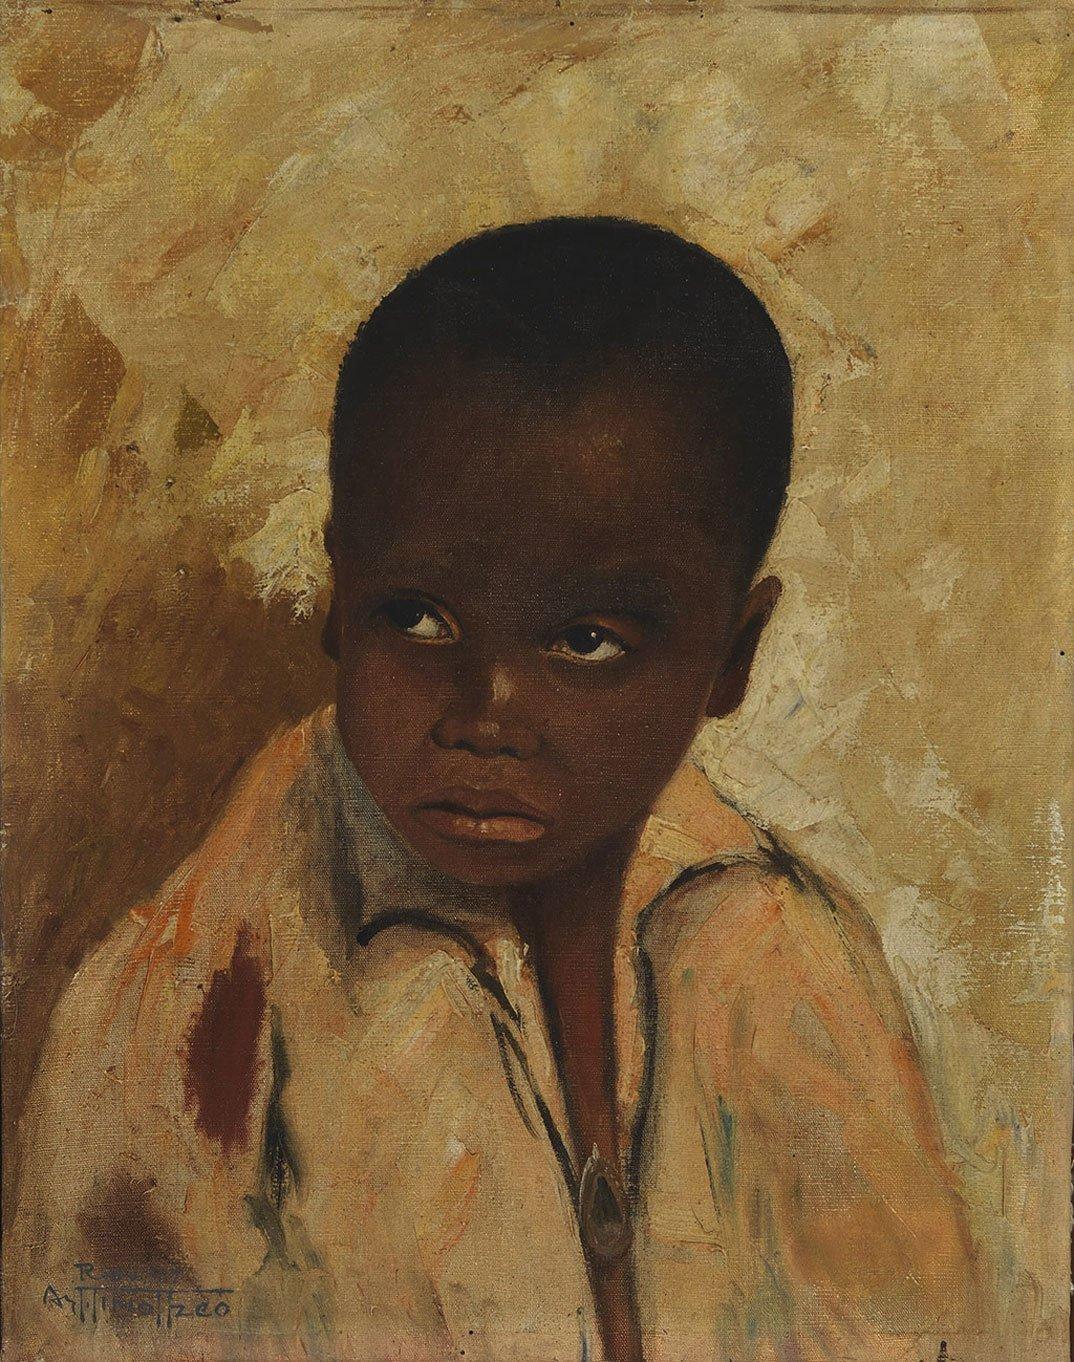 O menino (1917), Arthur Timótheo da Costa.